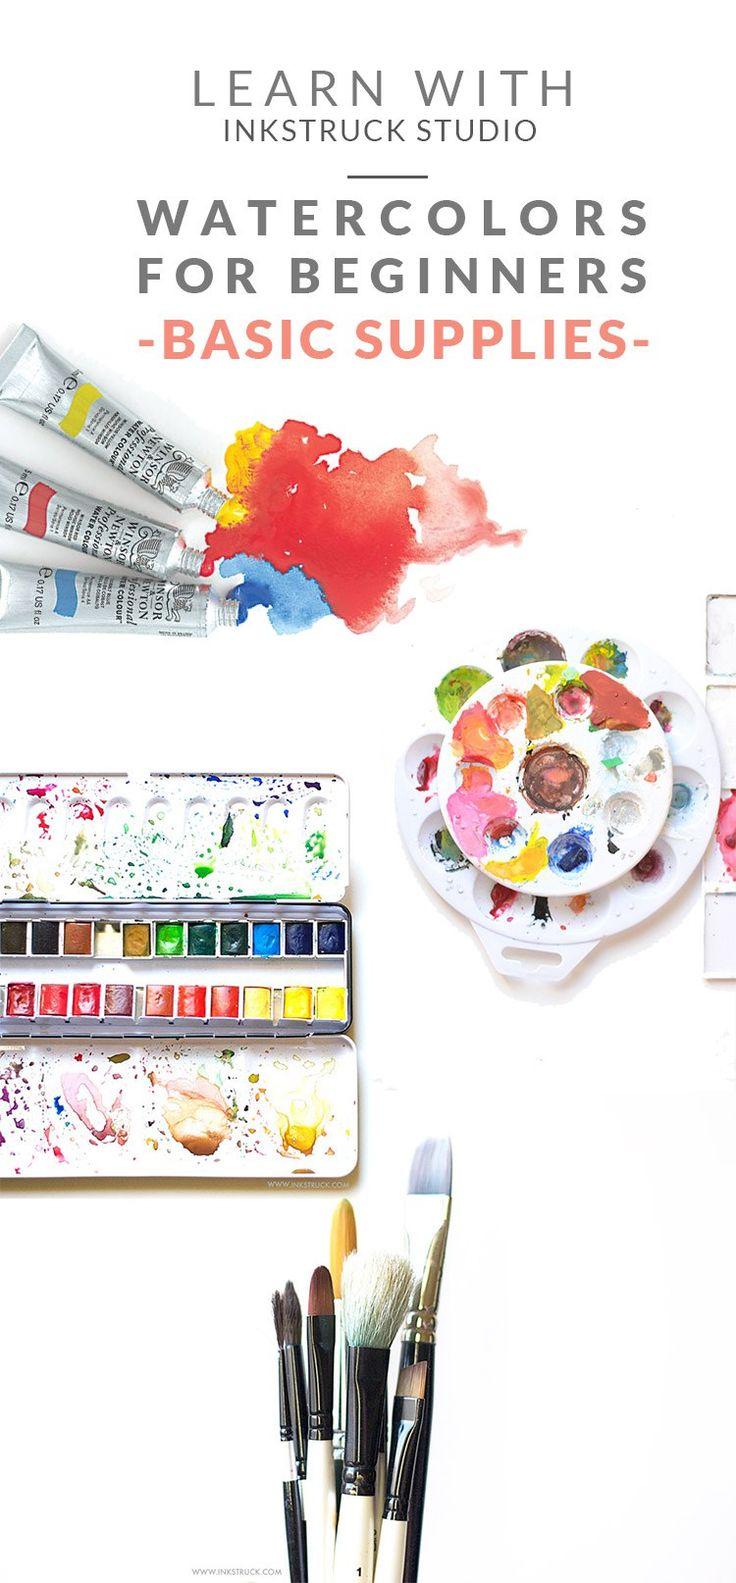 Watercolors for beginners -Zakkiya Hamza| Inkstruck Studio